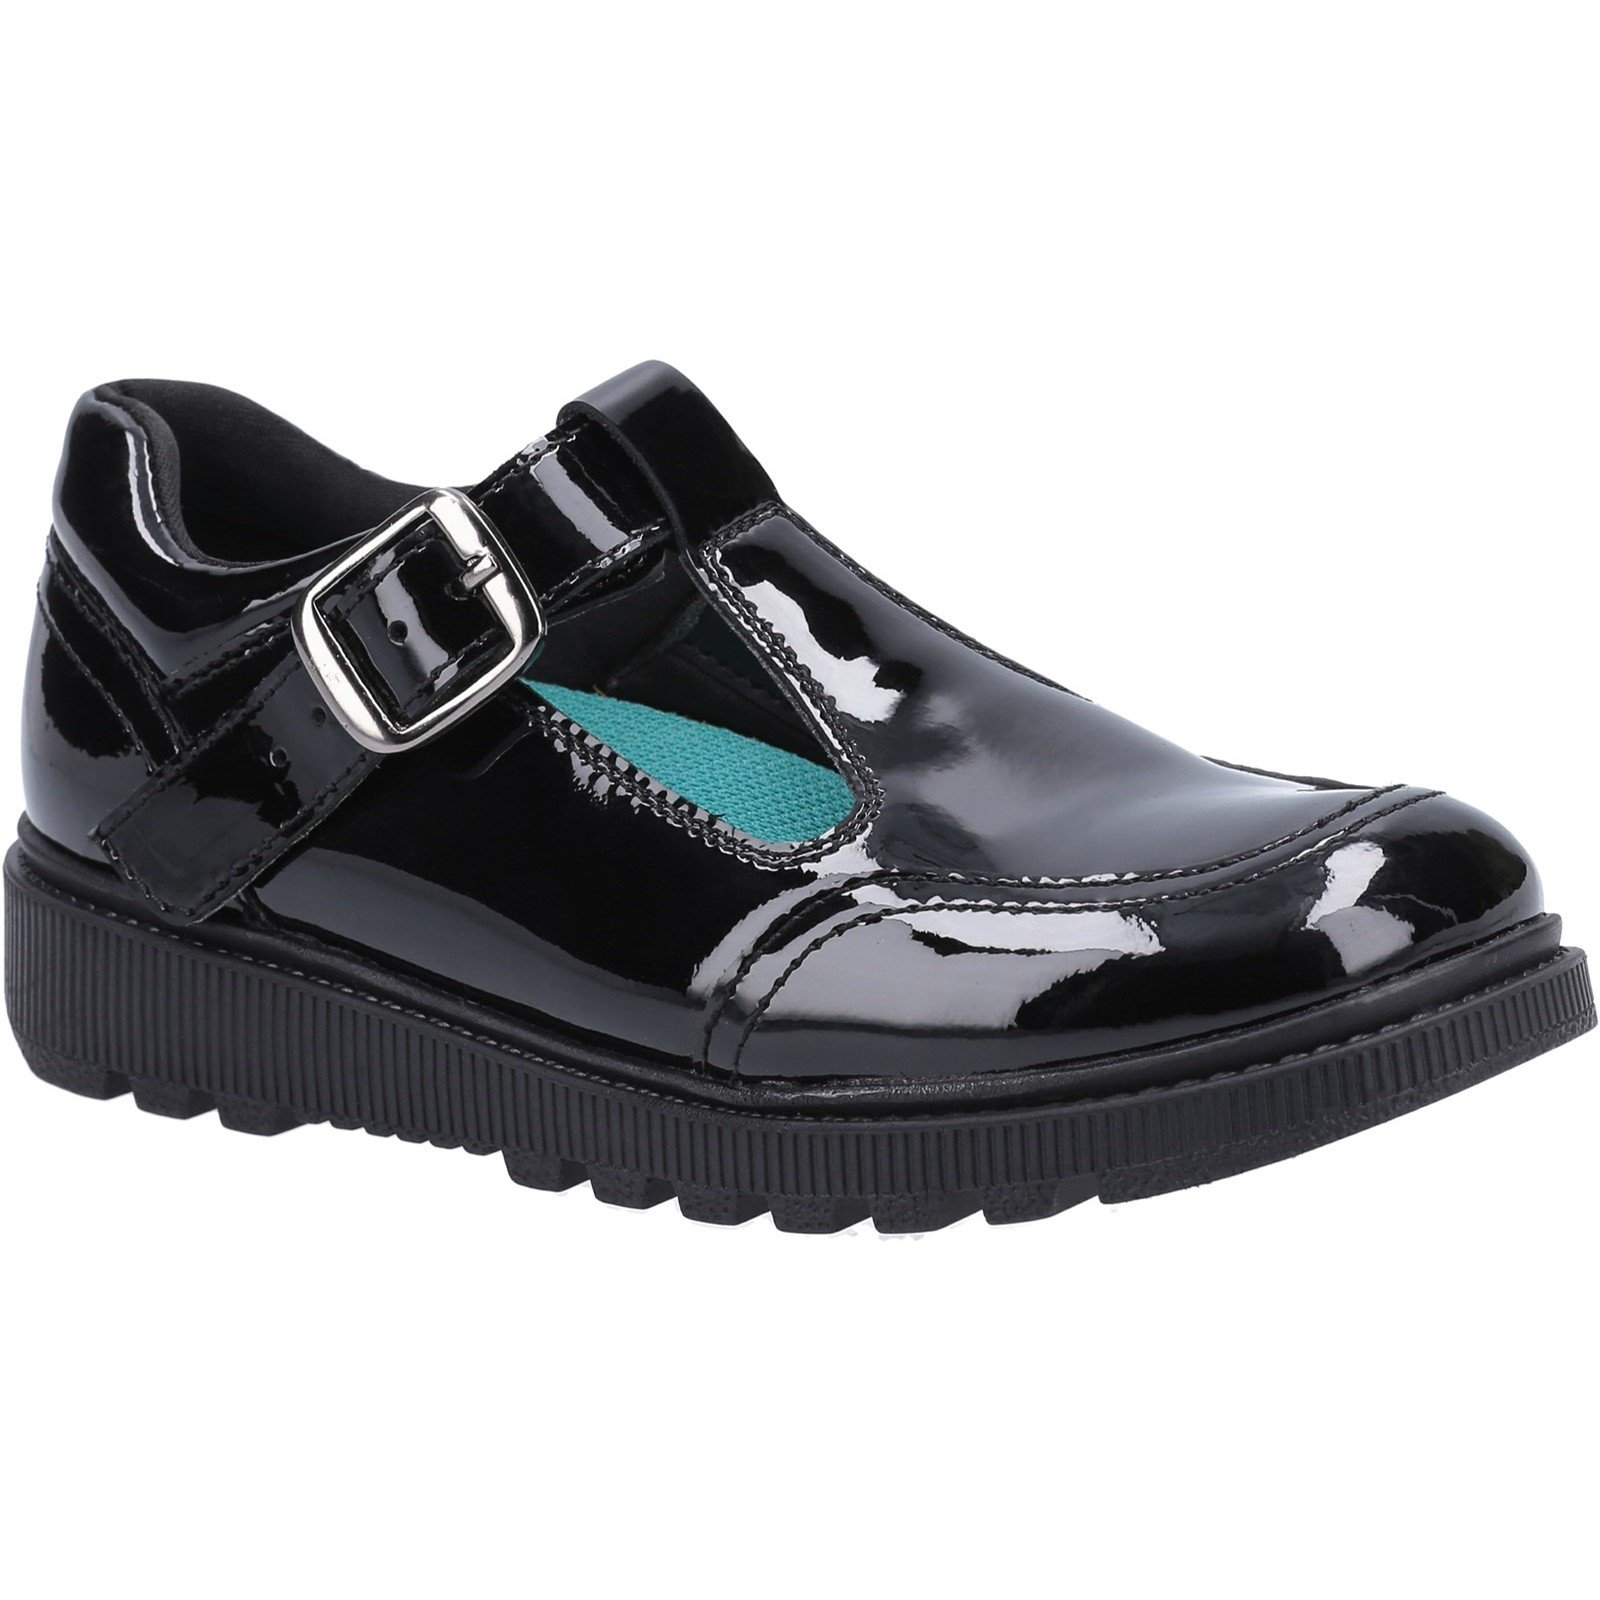 Hush Puppies Kid's Kerry Senior School Shoe Patent Black 30820 - Patent Black 6